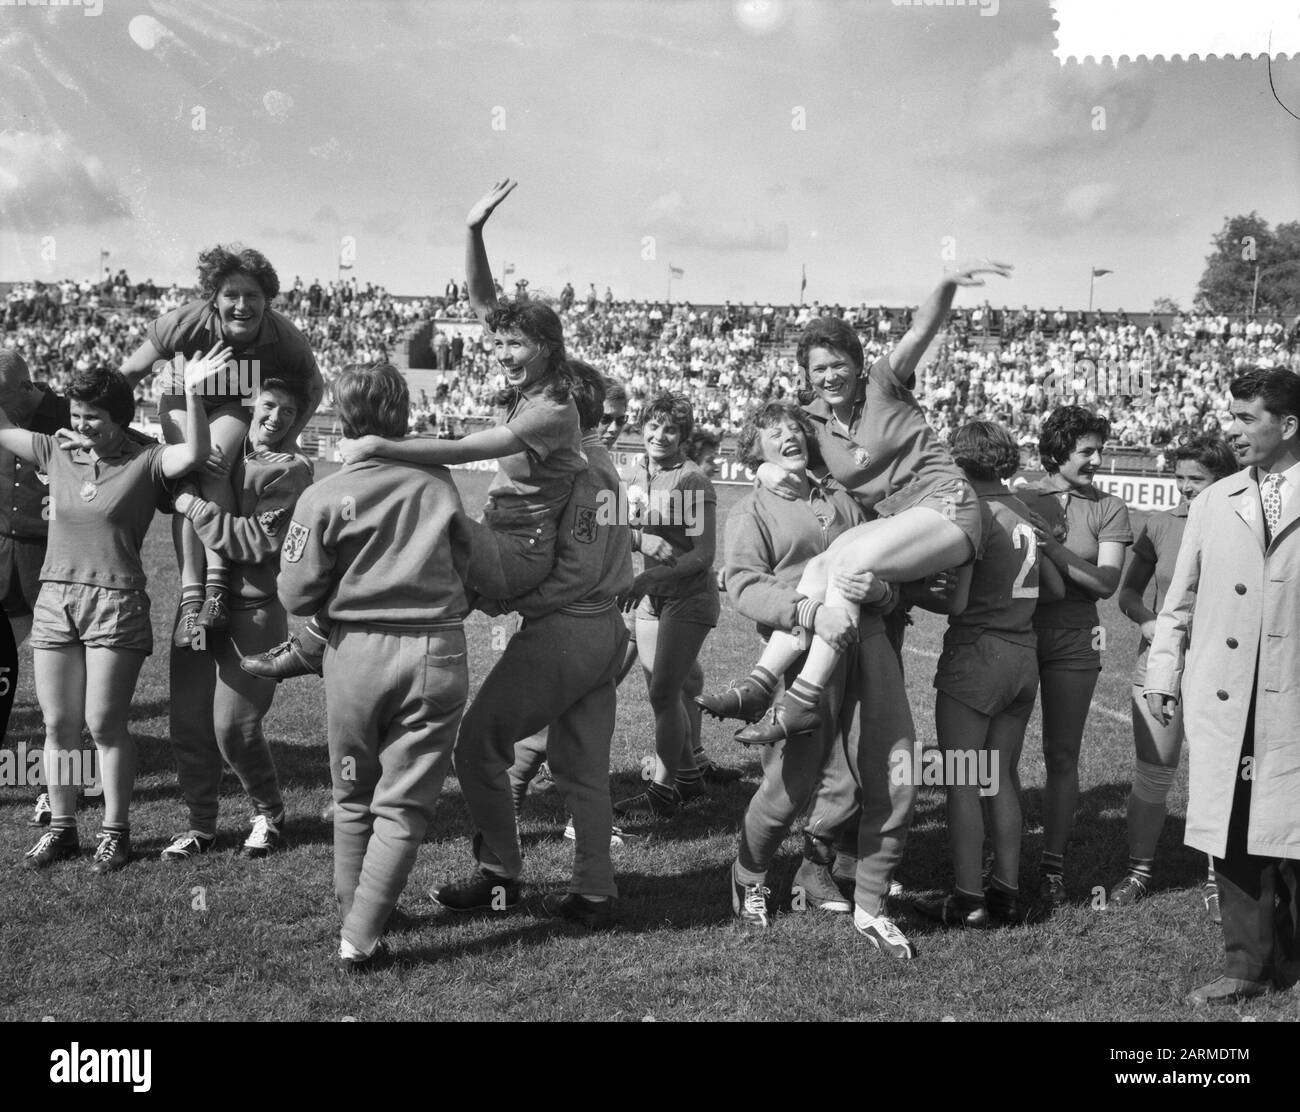 handball der frauen stockfotos und